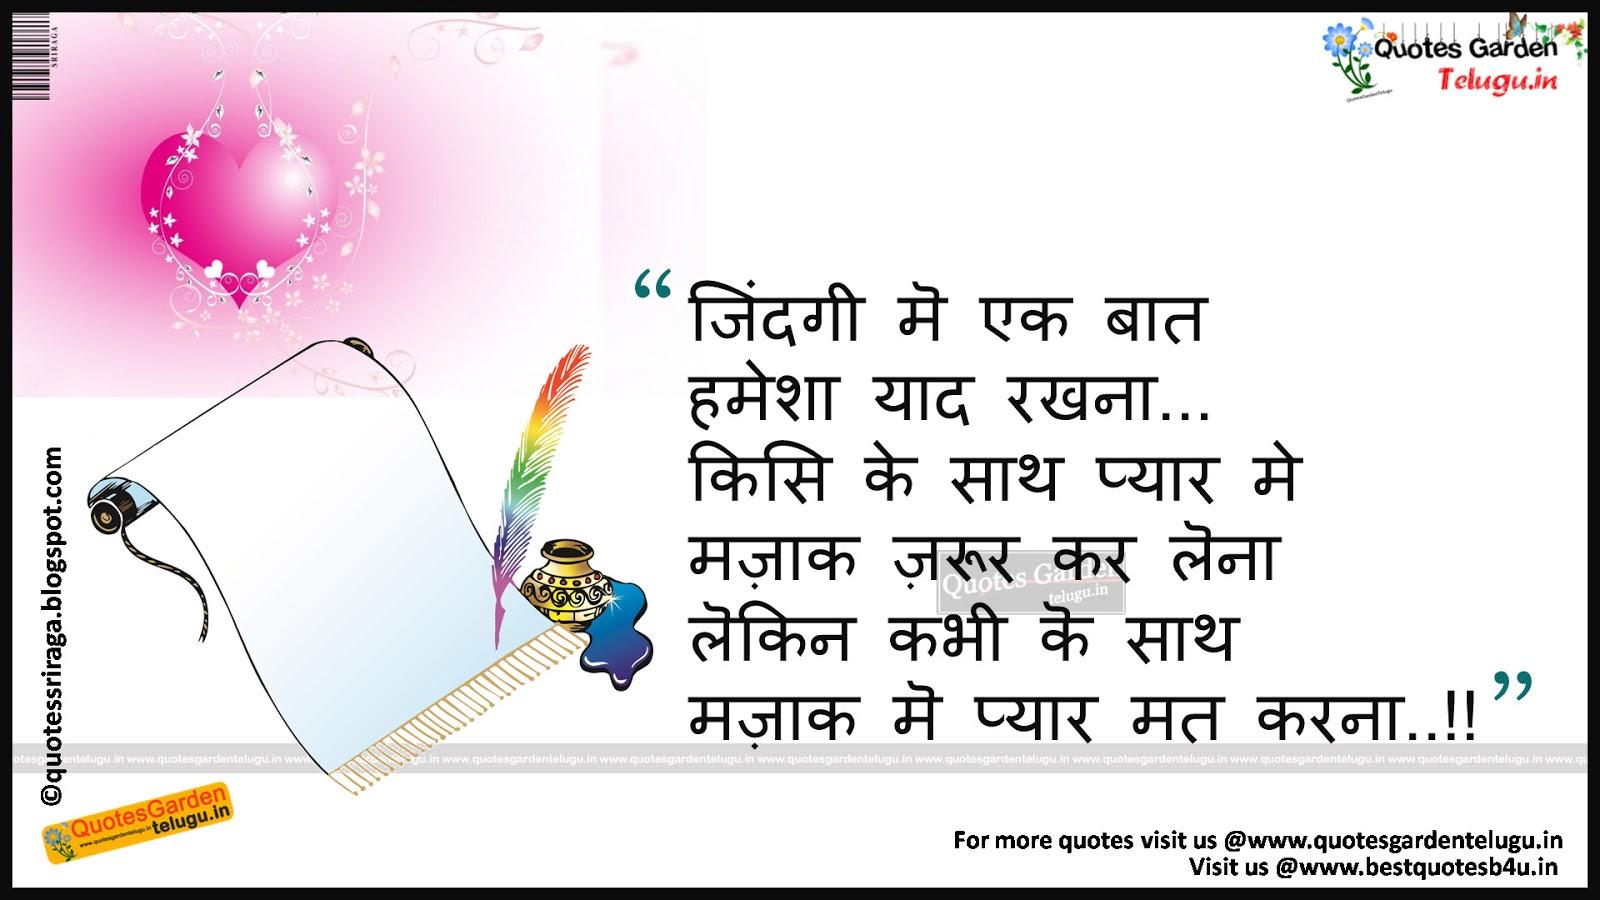 heart touching love quotes in hindi | QUOTES GARDEN TELUGU | Telugu ...